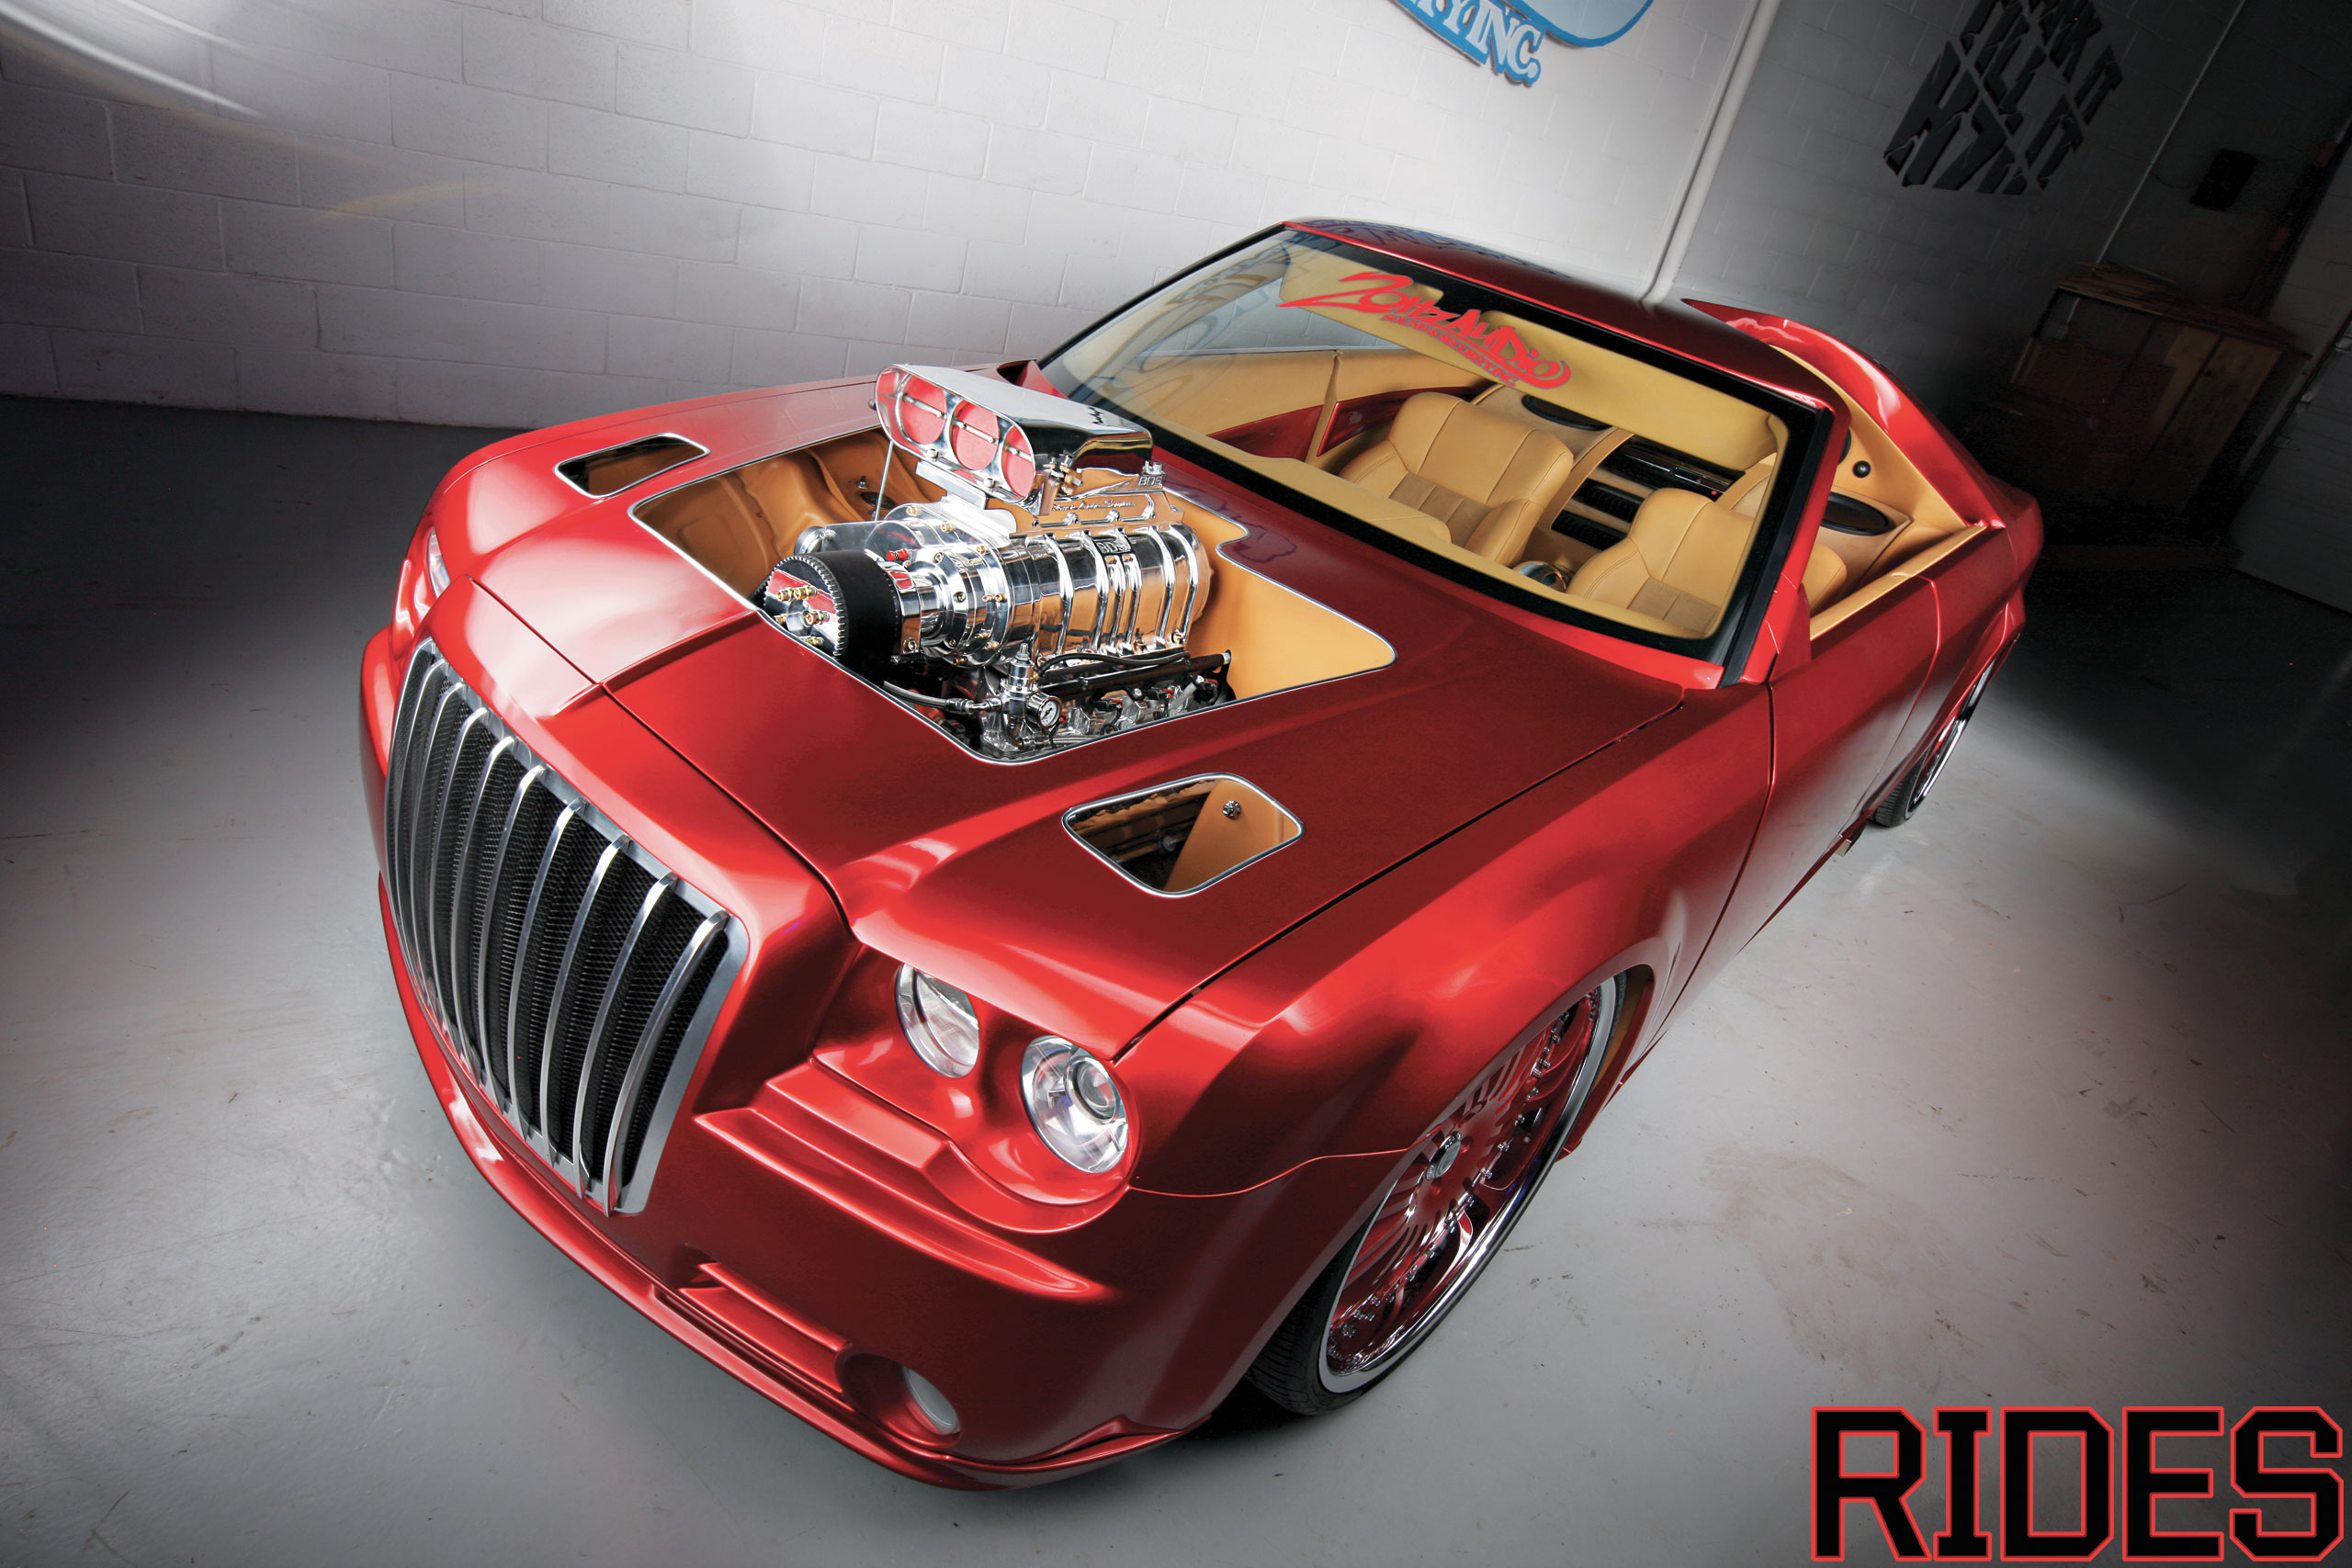 2006 Chrysler 300c Srt8 Rides Magazine